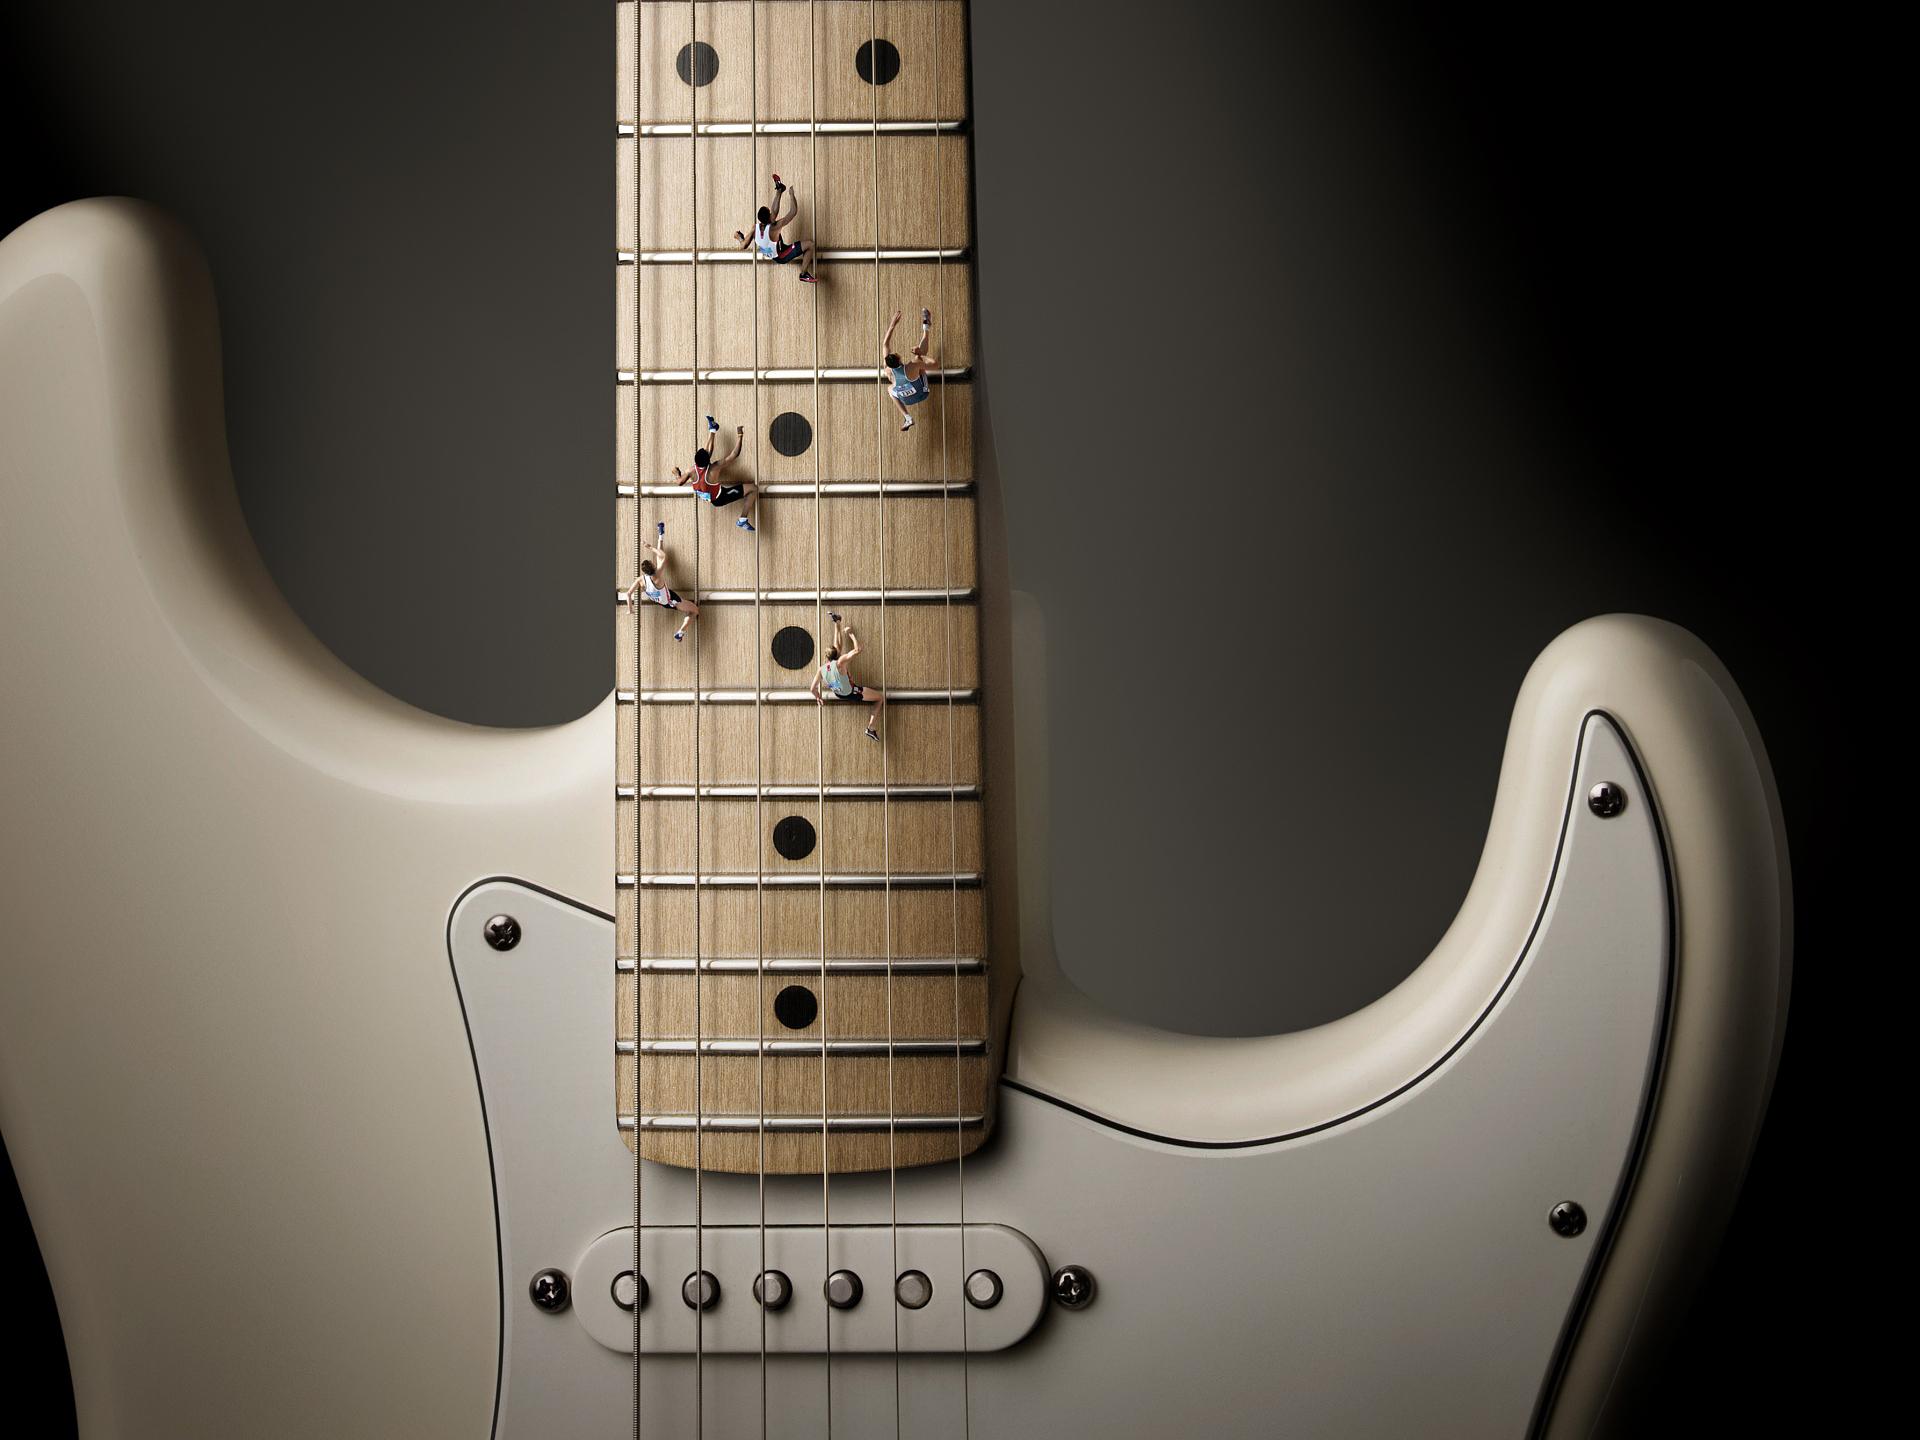 Guitar fender running 1920x1440